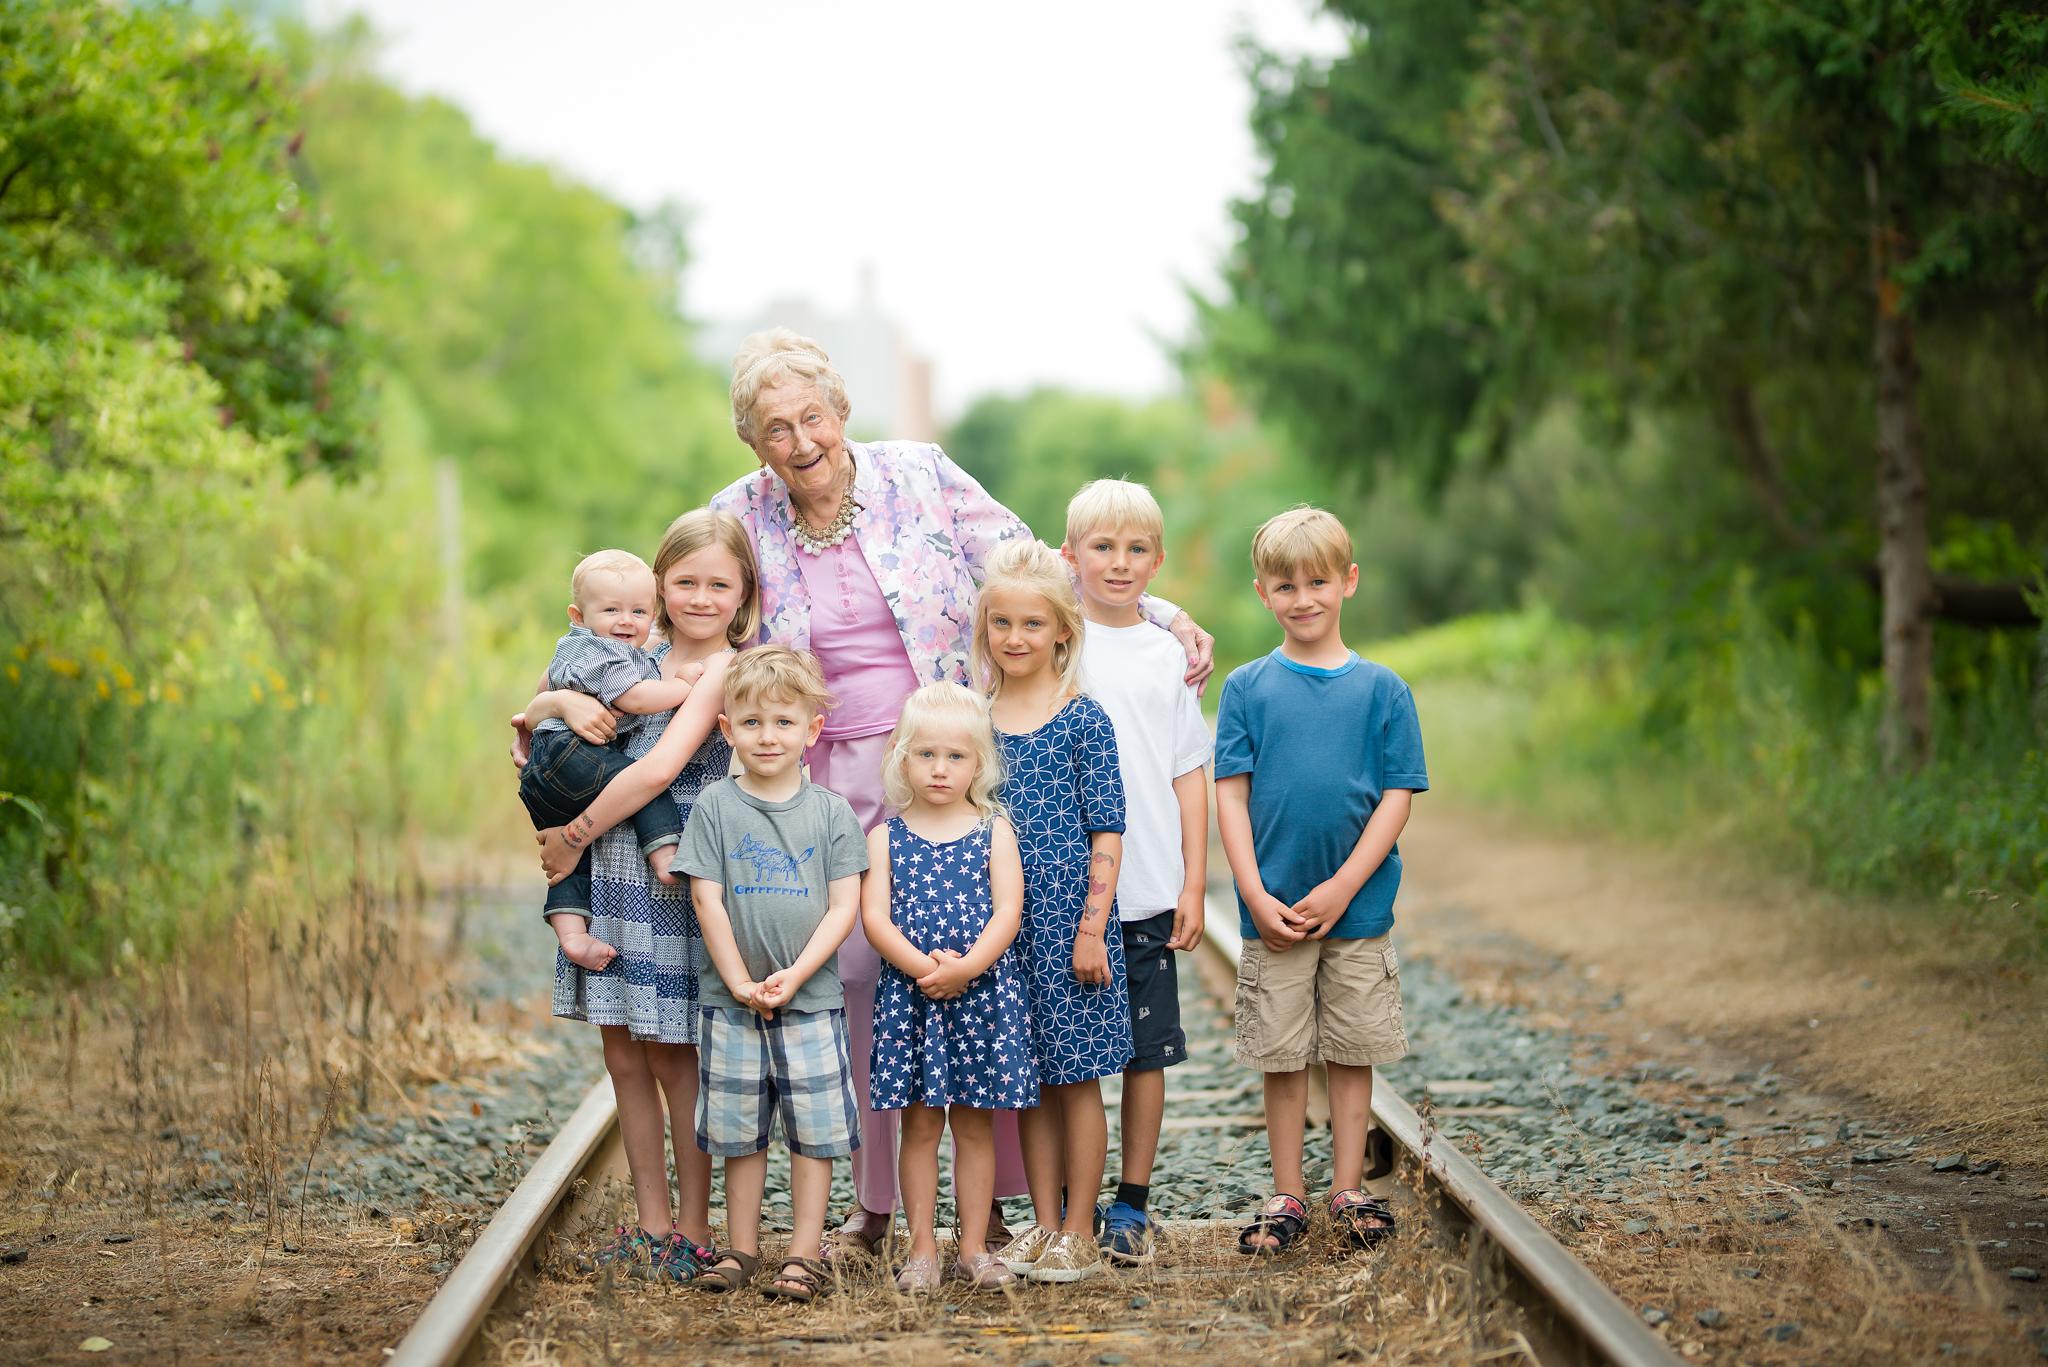 Family336NaomiLuciennePhotography082018-Edit.jpg